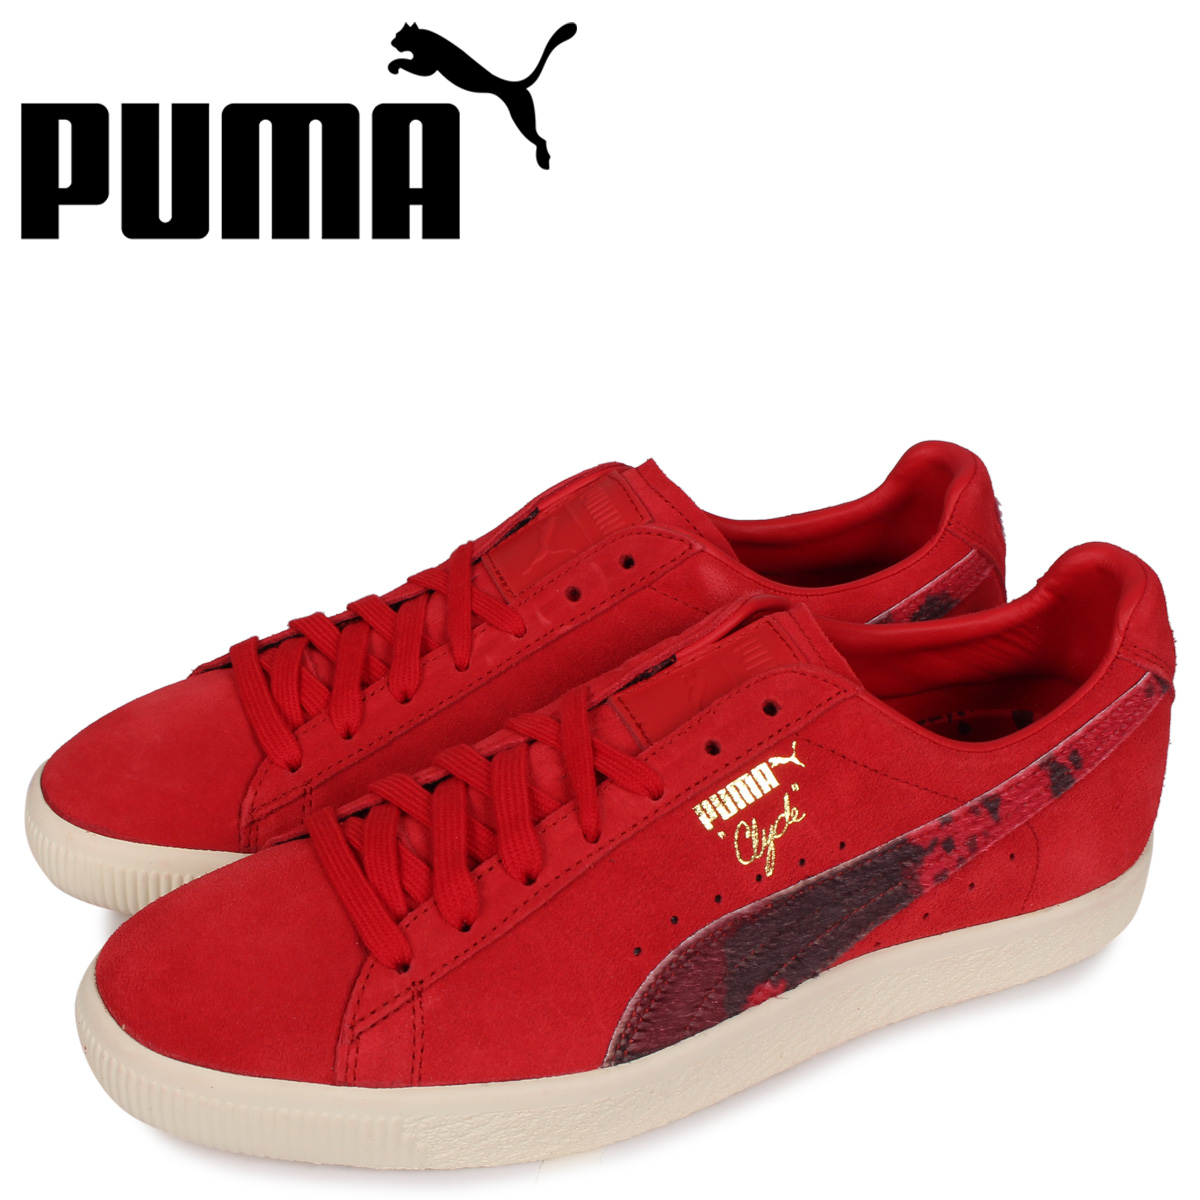 PUMA プーマ クライド パッカー スニーカー メンズ CLYDE X PACKER レッド 363507-02